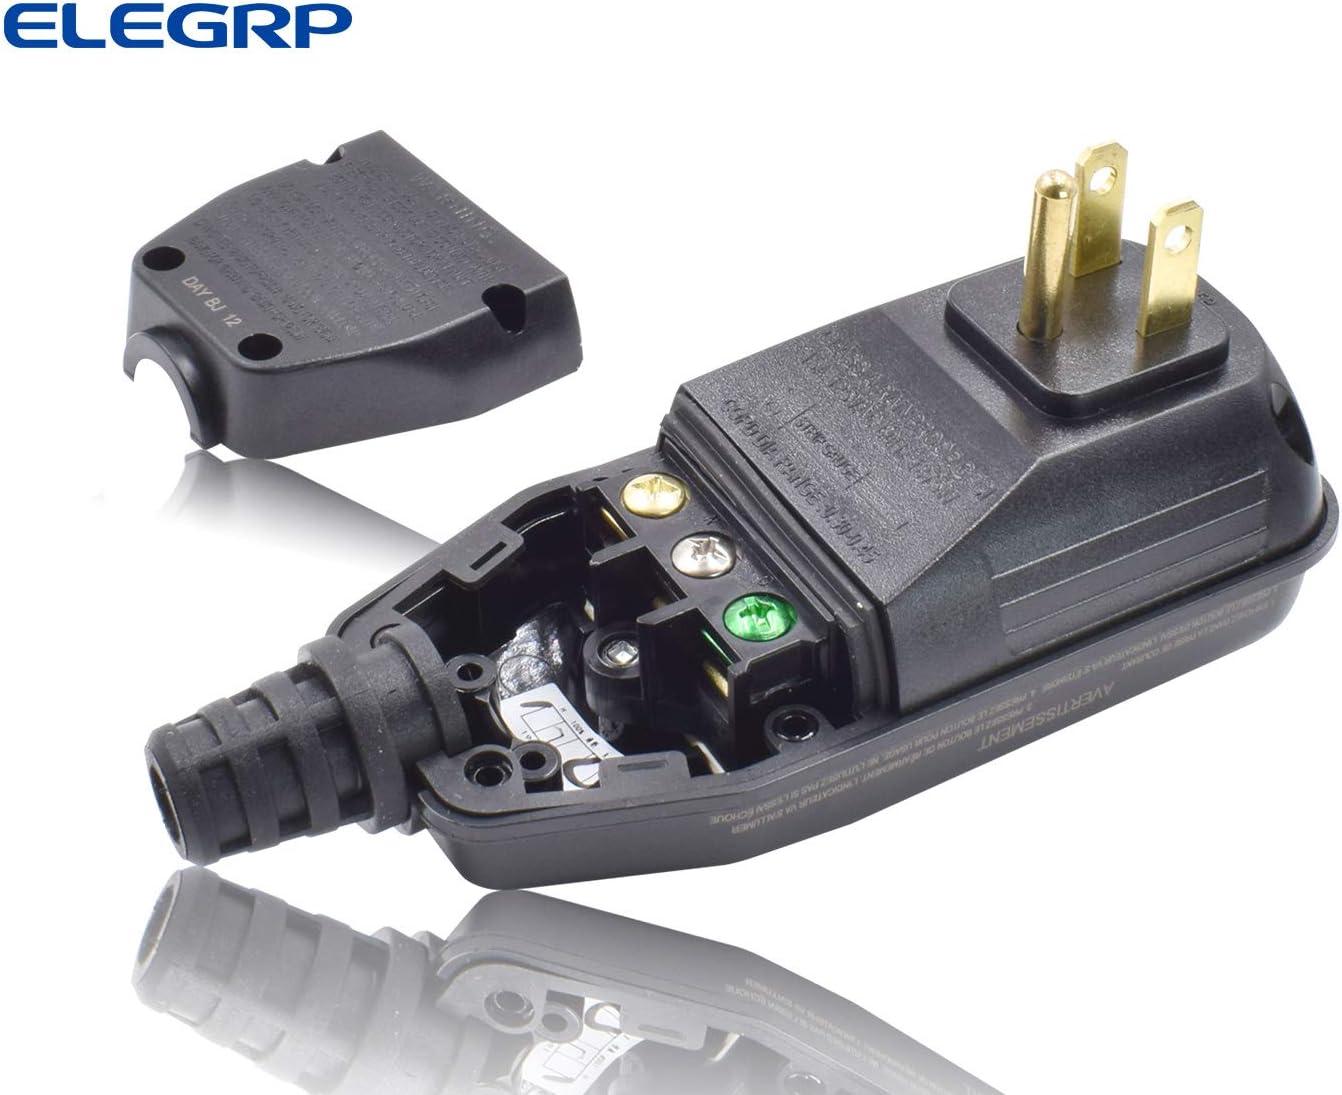 ELEGRP G1215CA Auto Reset Inline GFCI  Plug Assembly 15 Amp 3 Wires 3-Prongs NEM